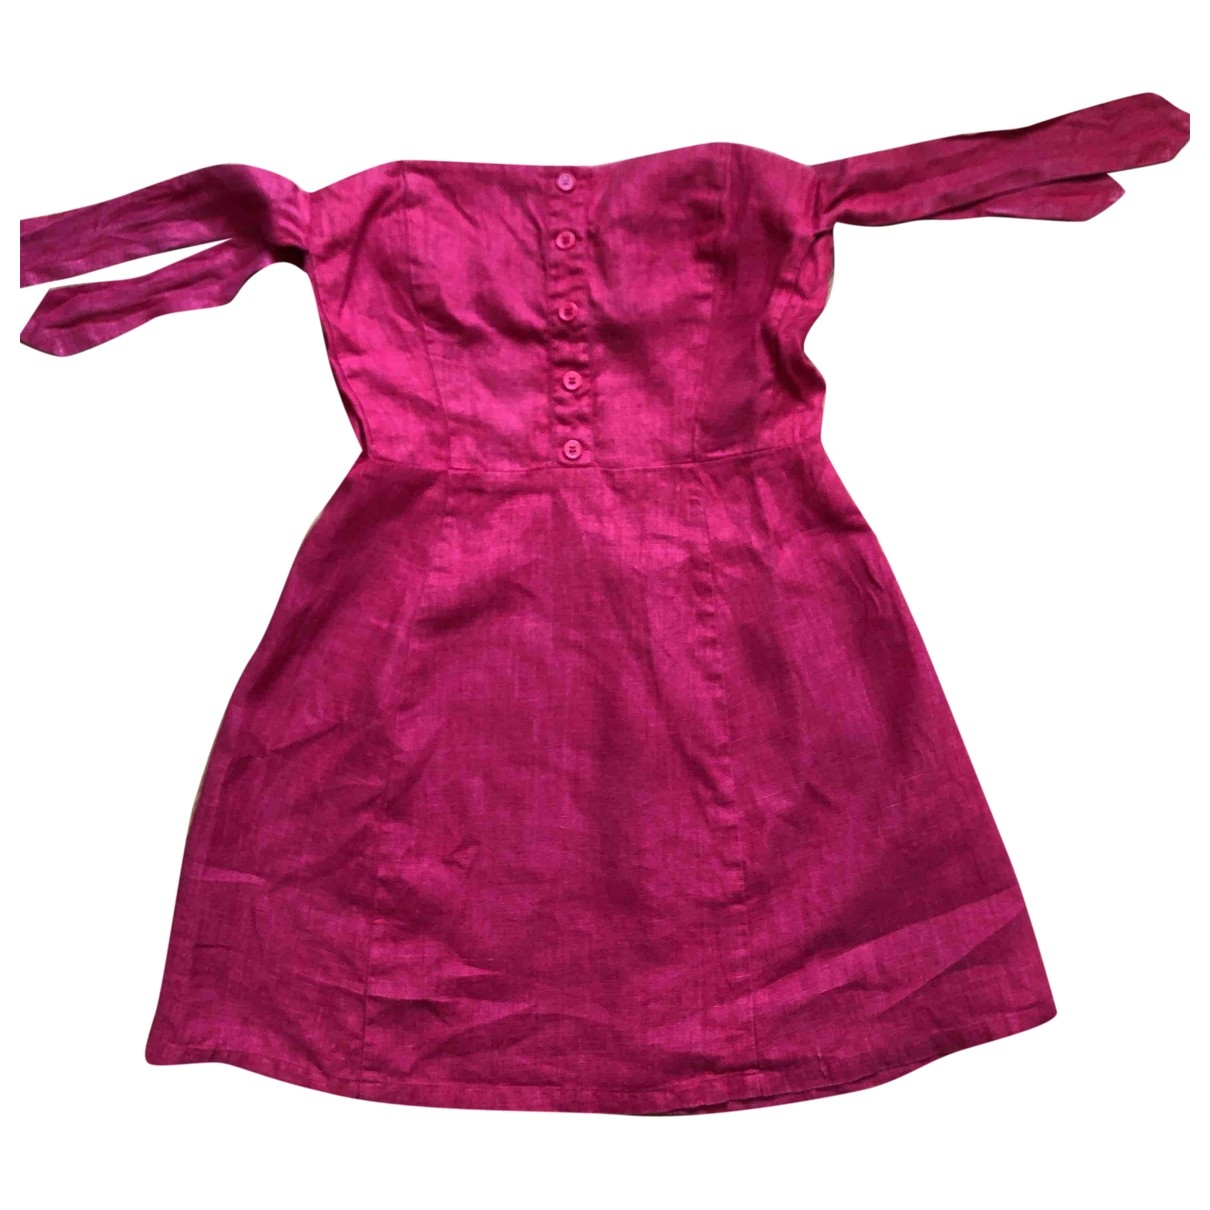 Reformation - Robe   pour femme en lin - rouge